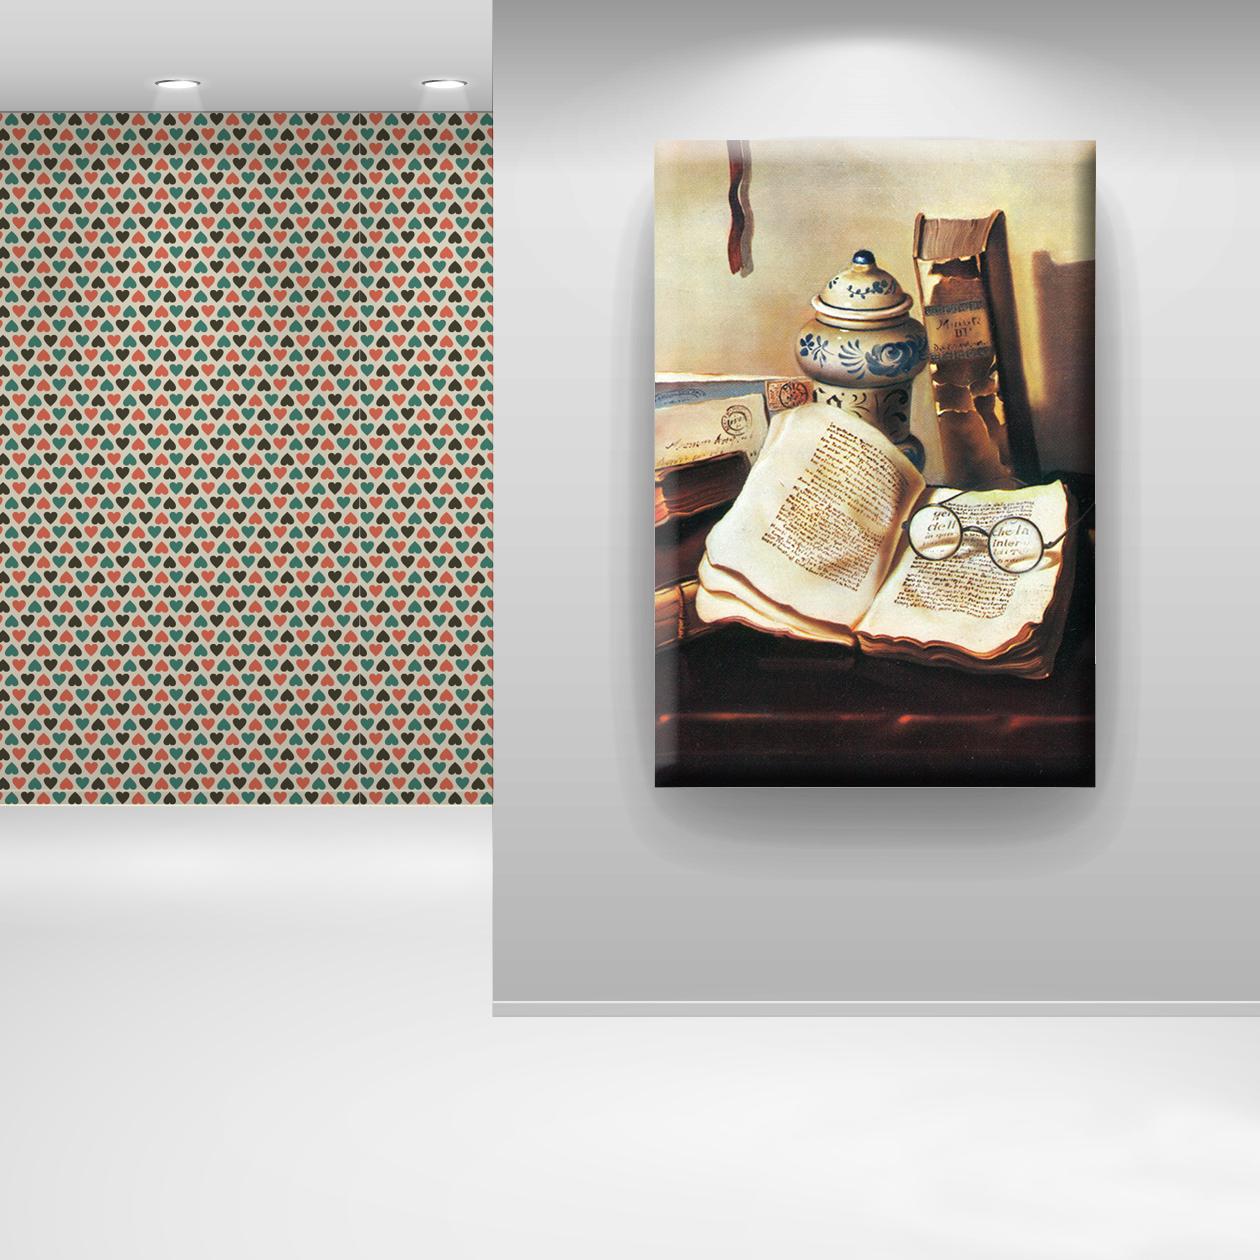 Quadri fotografici arredamento sx41 regardsdefemmes for Decora la tua casa